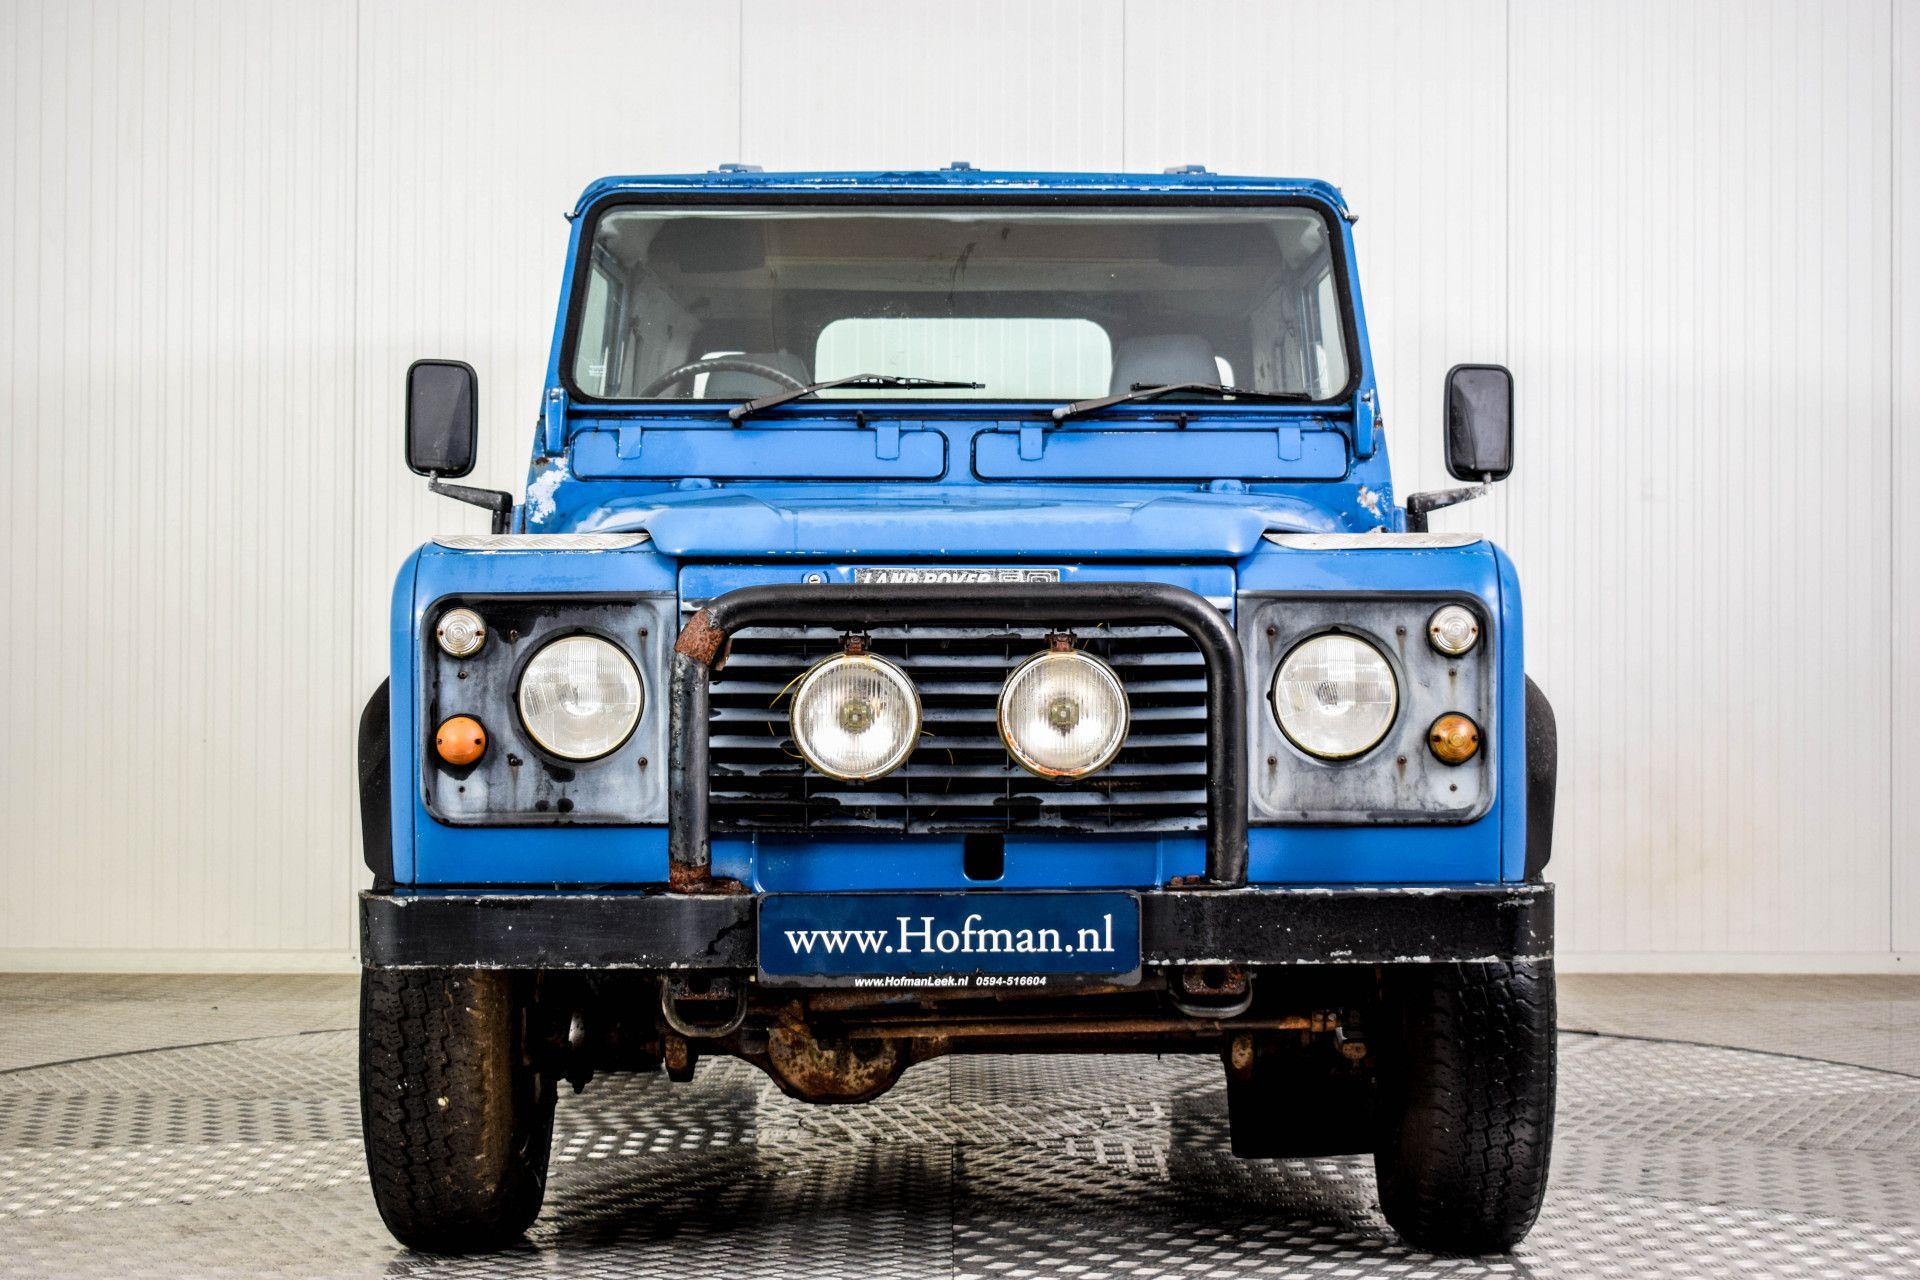 Land Rover Defender 90 2.5 TDI Foto 3